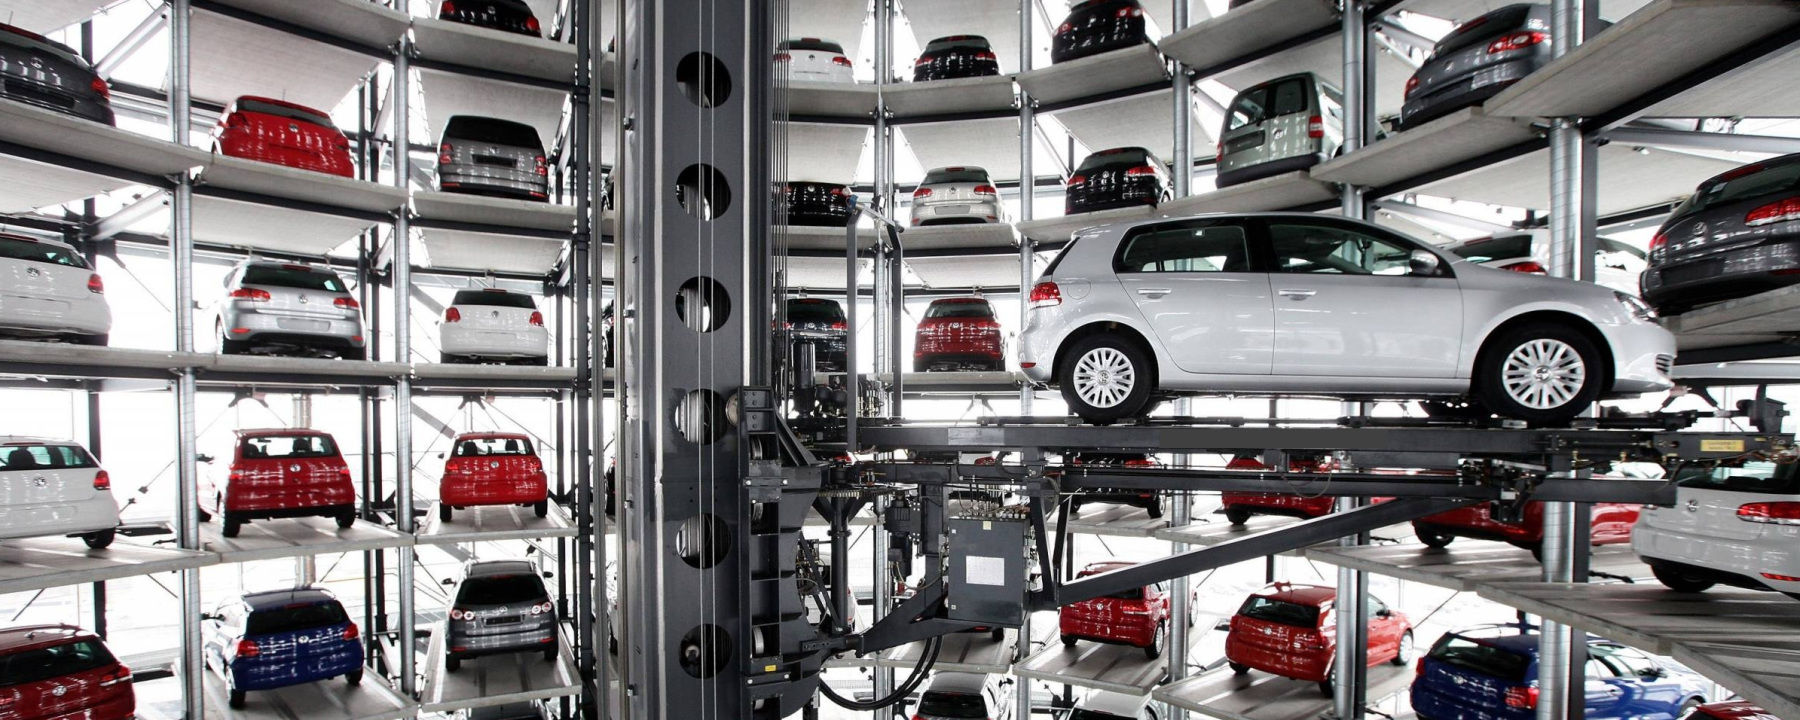 Volkswagen kategorisi için resim